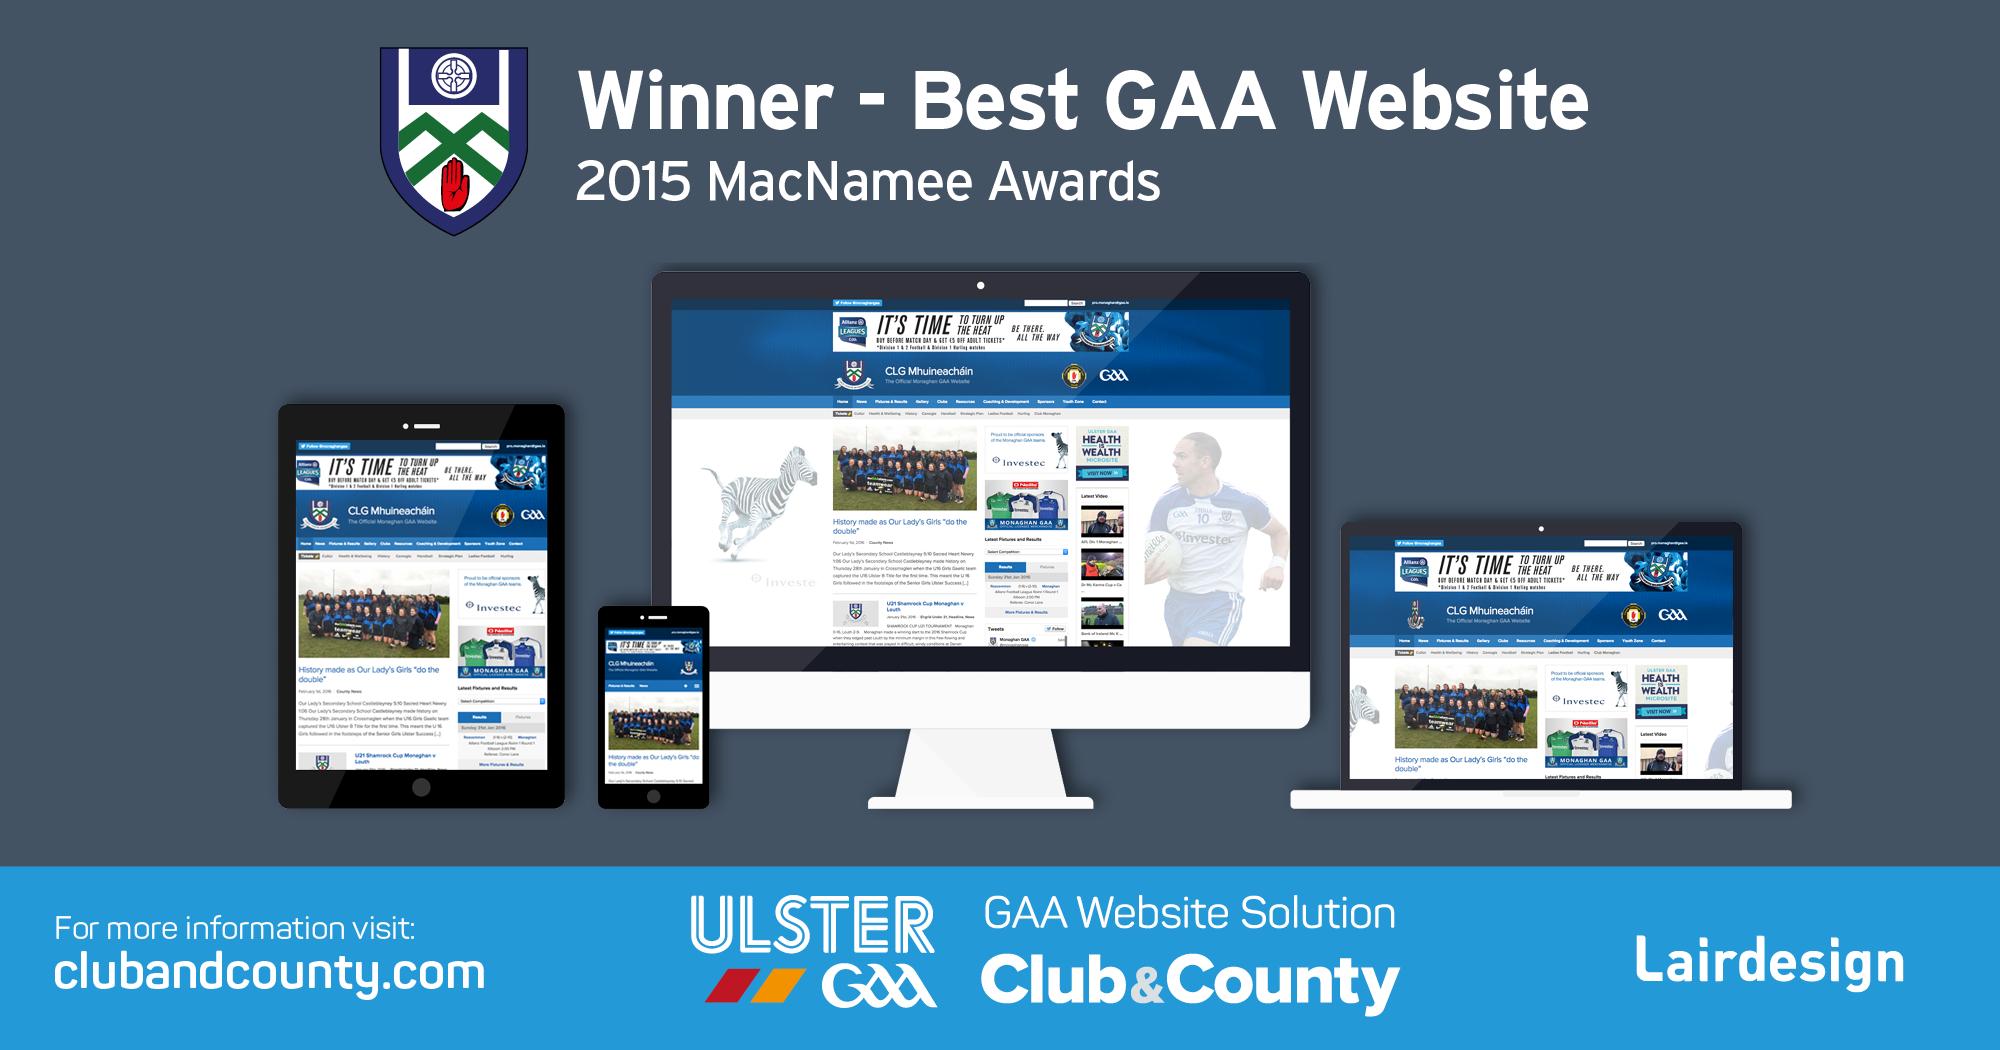 Monaghangaa.ie wins GAA Website of the Year at the 2015 MacNamee Awards